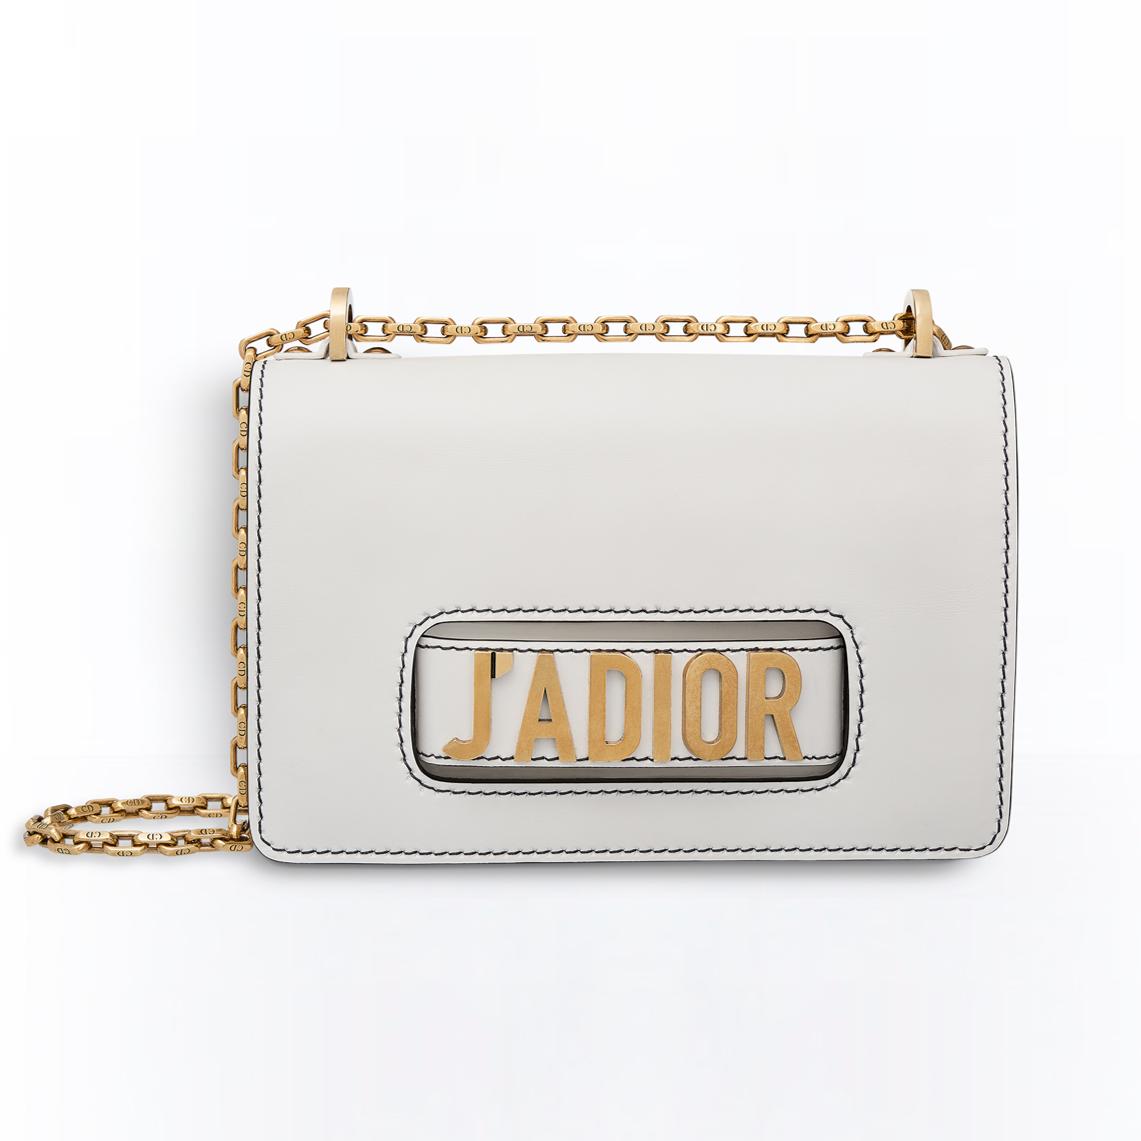 Dior J'adior bag white